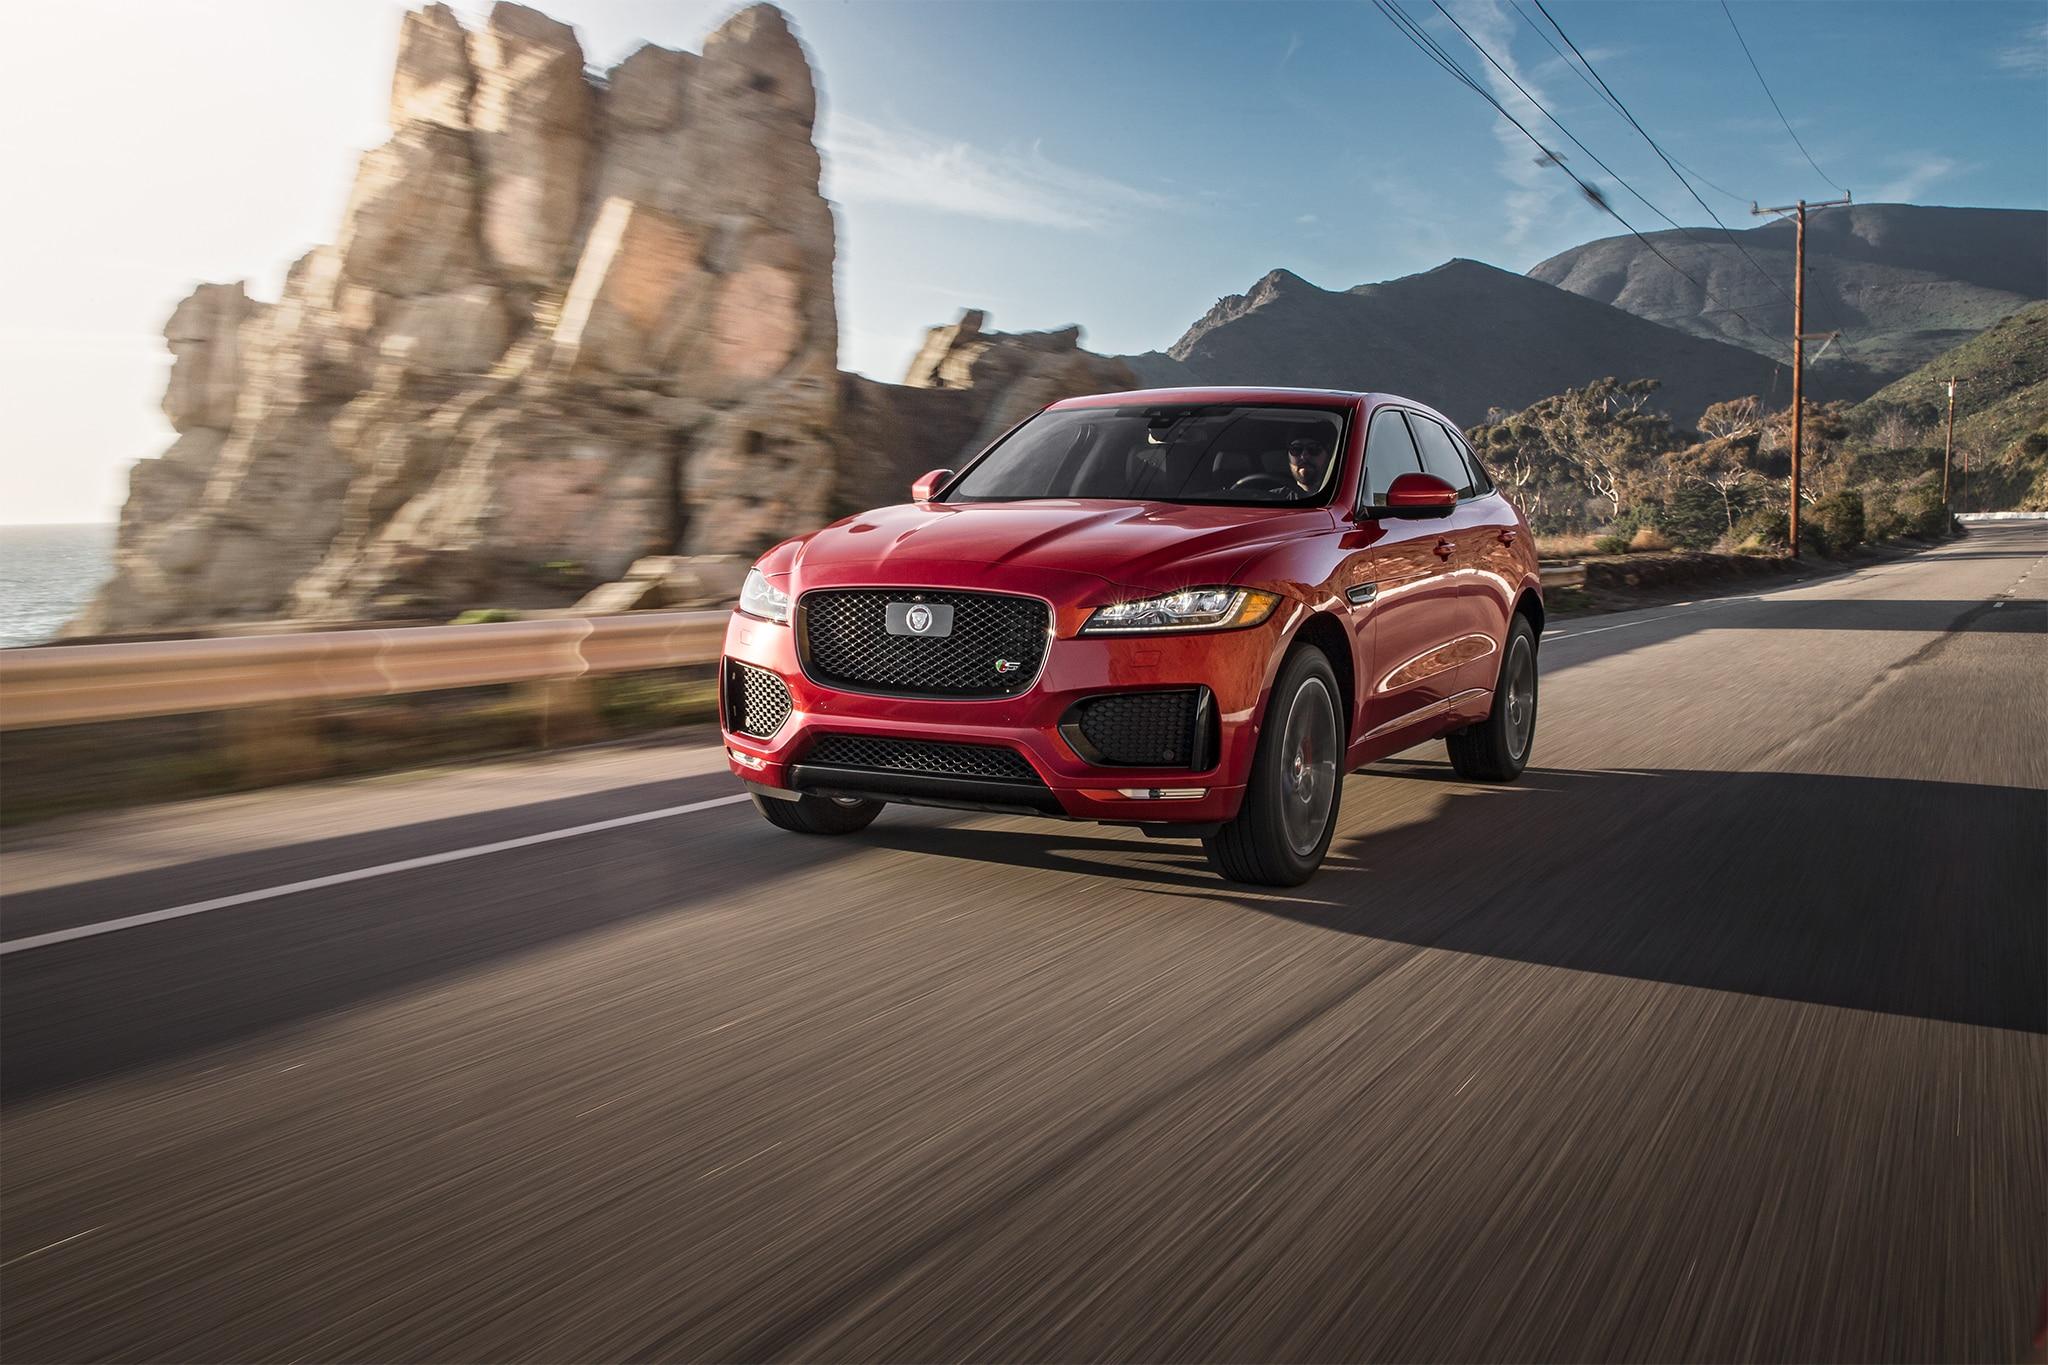 2017 Jaguar F Pace S Front Three Quarter In Motion 02